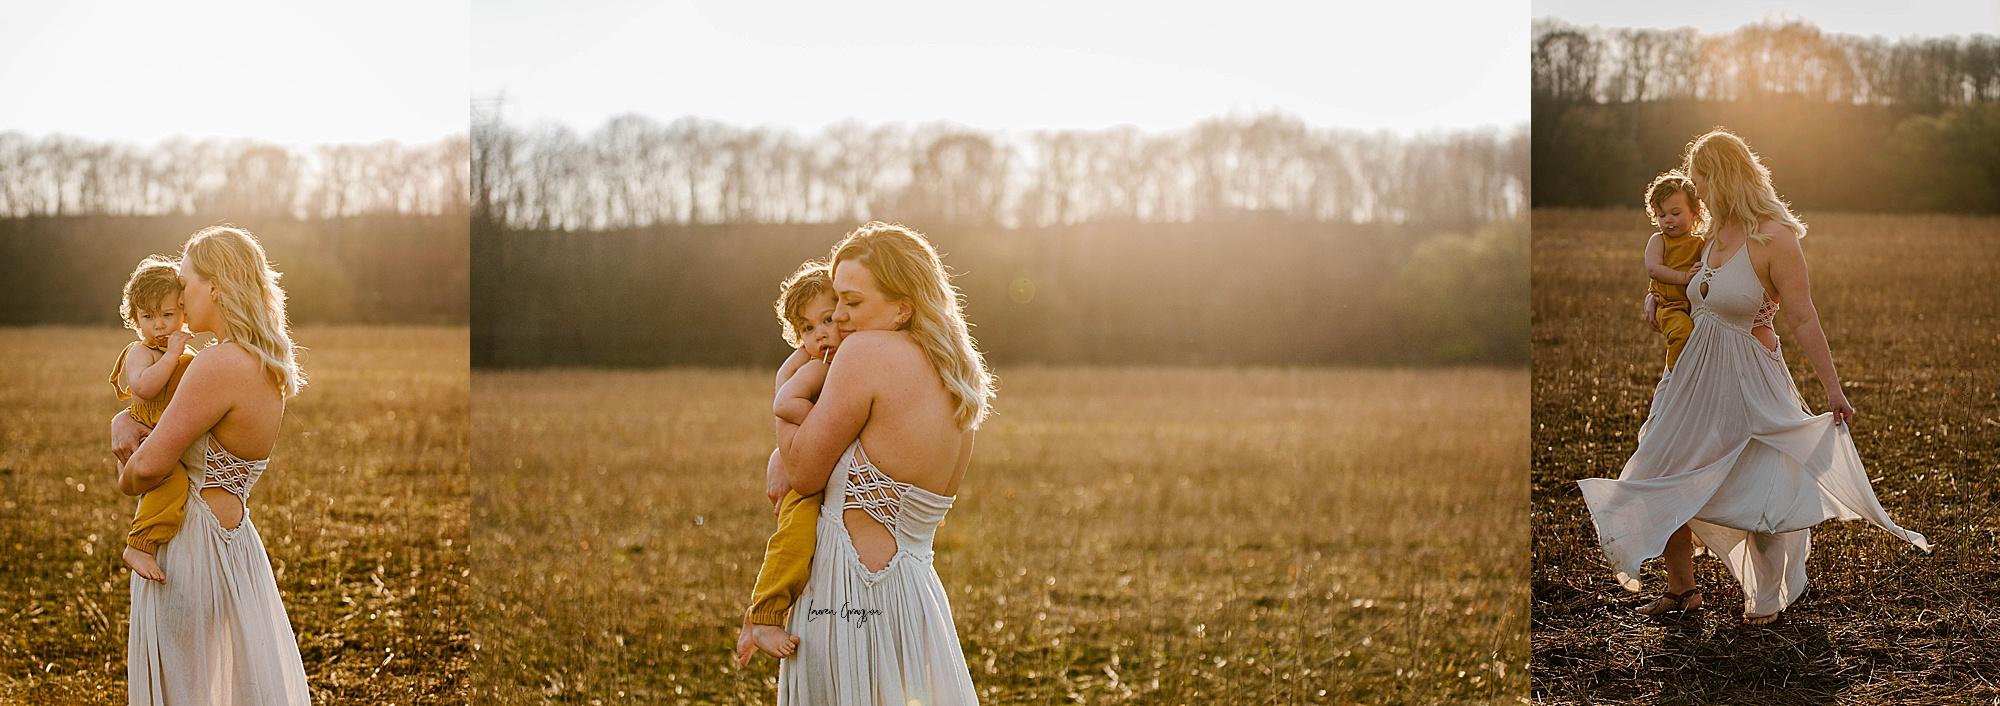 lauren-grayson-photography-akron-ohio-family-mom-boys-field-spring-outdoor-session_0003.jpg